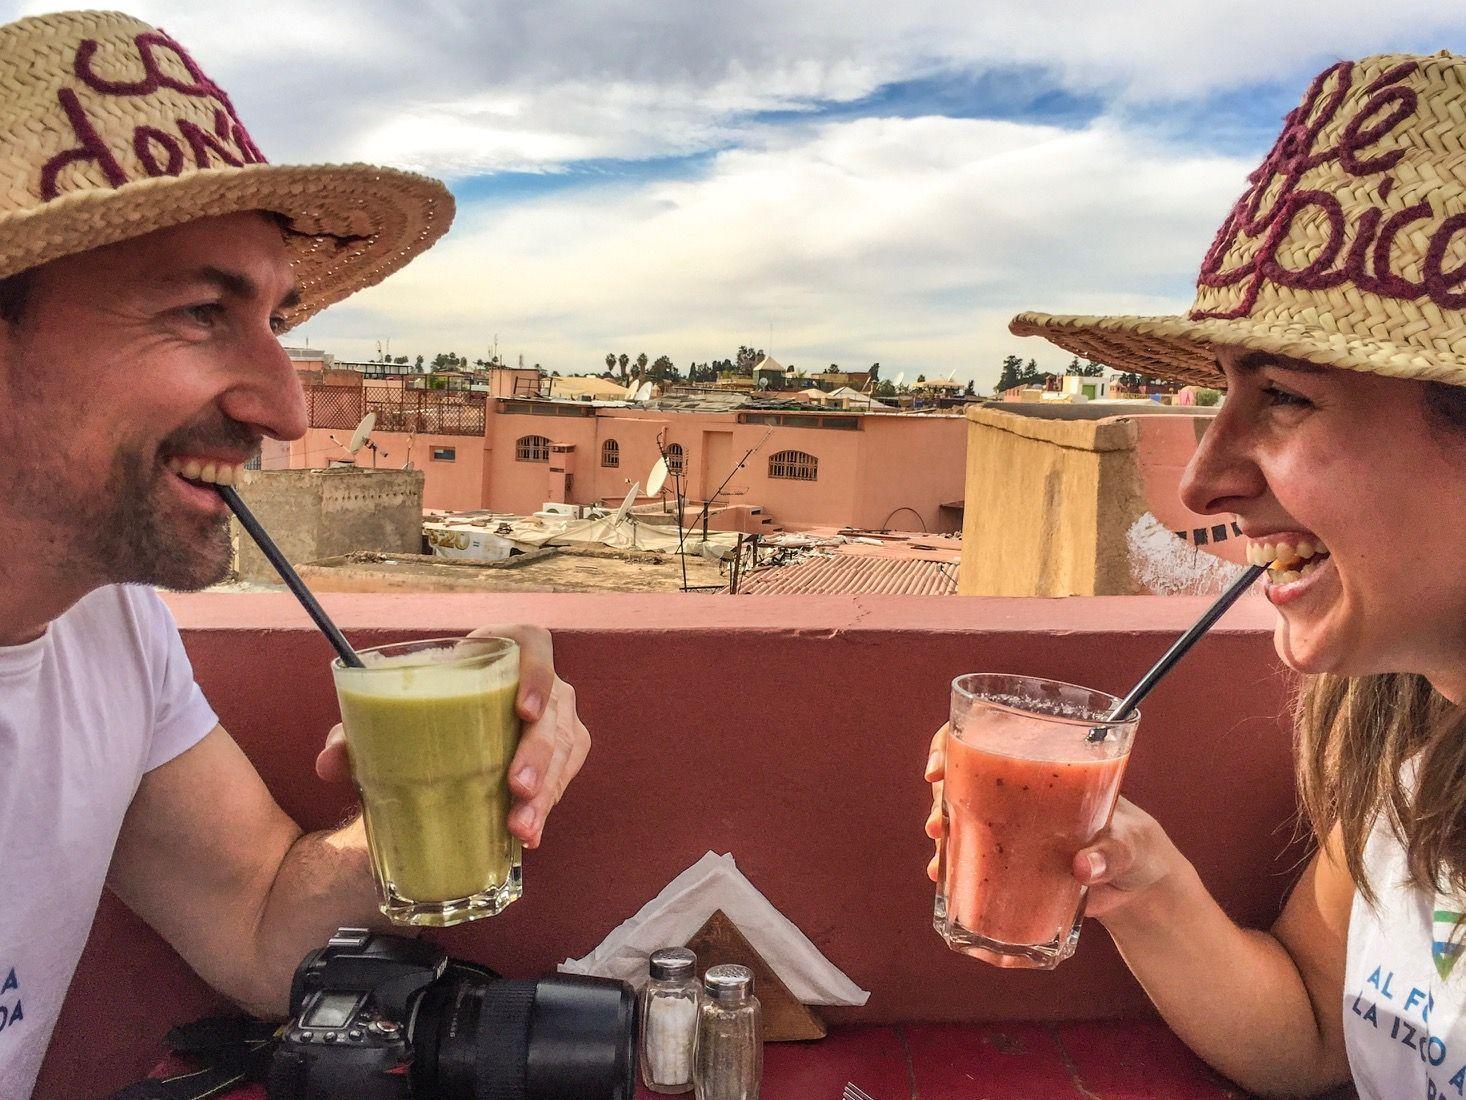 Al Fondo a la Izquierda - Blog de viajes